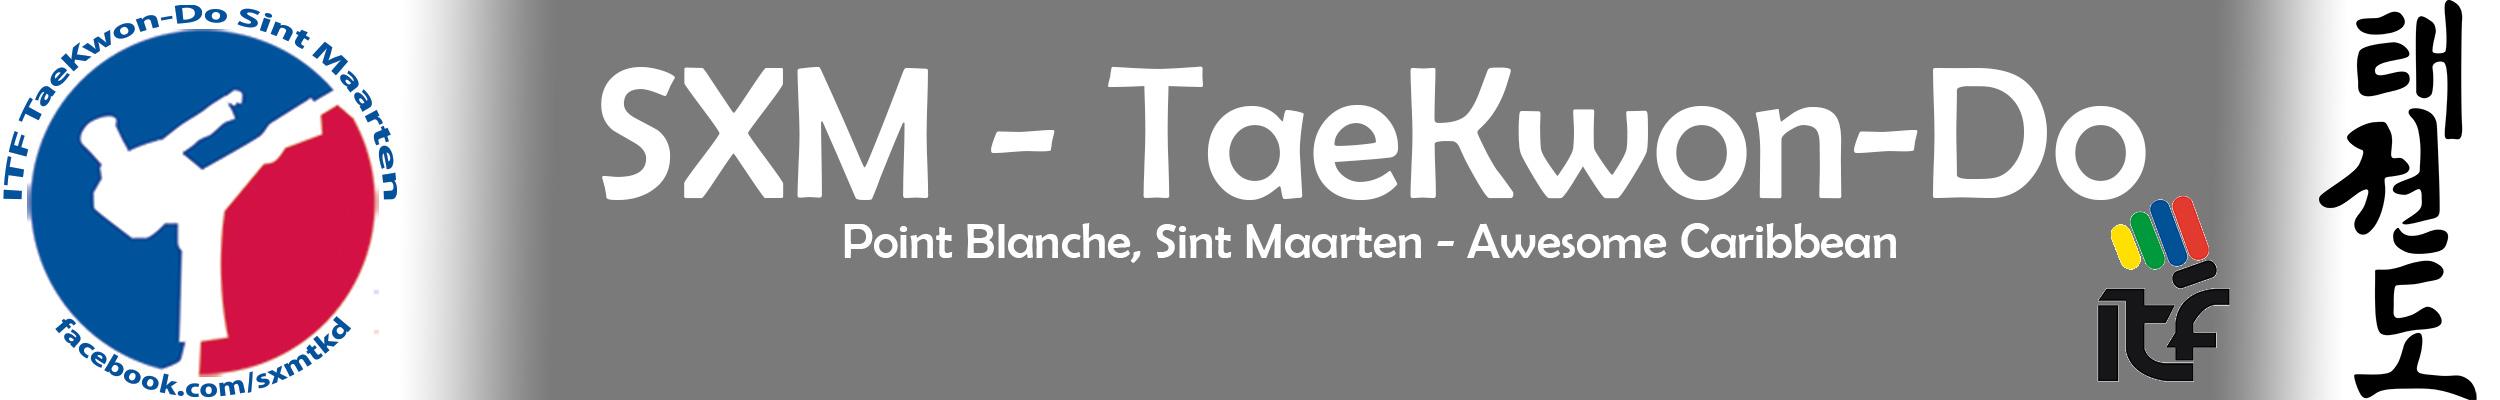 SXM TaeKwon-Do